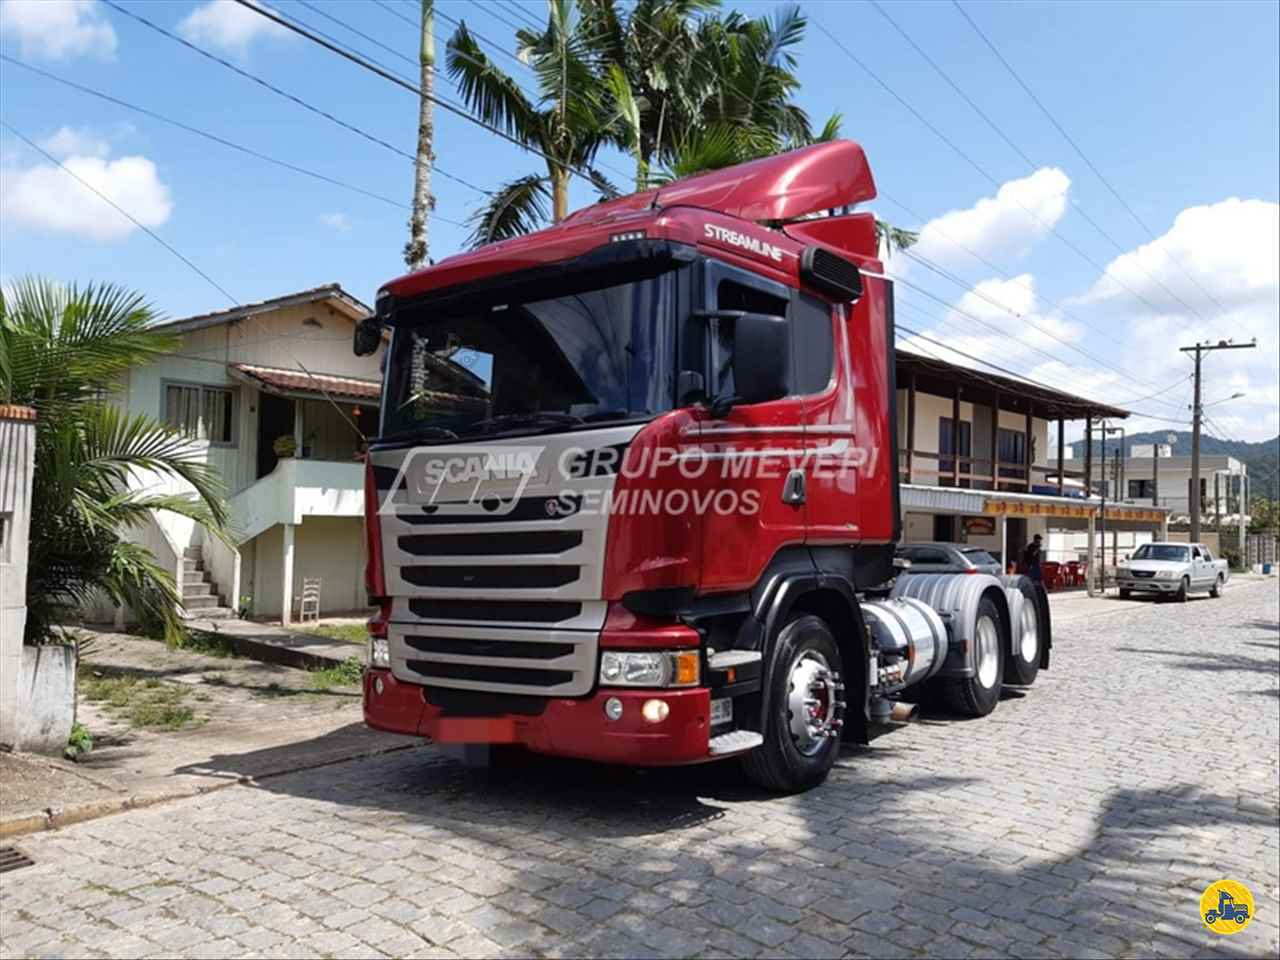 CAMINHAO SCANIA SCANIA 440 Cavalo Mecânico Truck 6x2 Mevale - Scania ITAJAI SANTA CATARINA SC